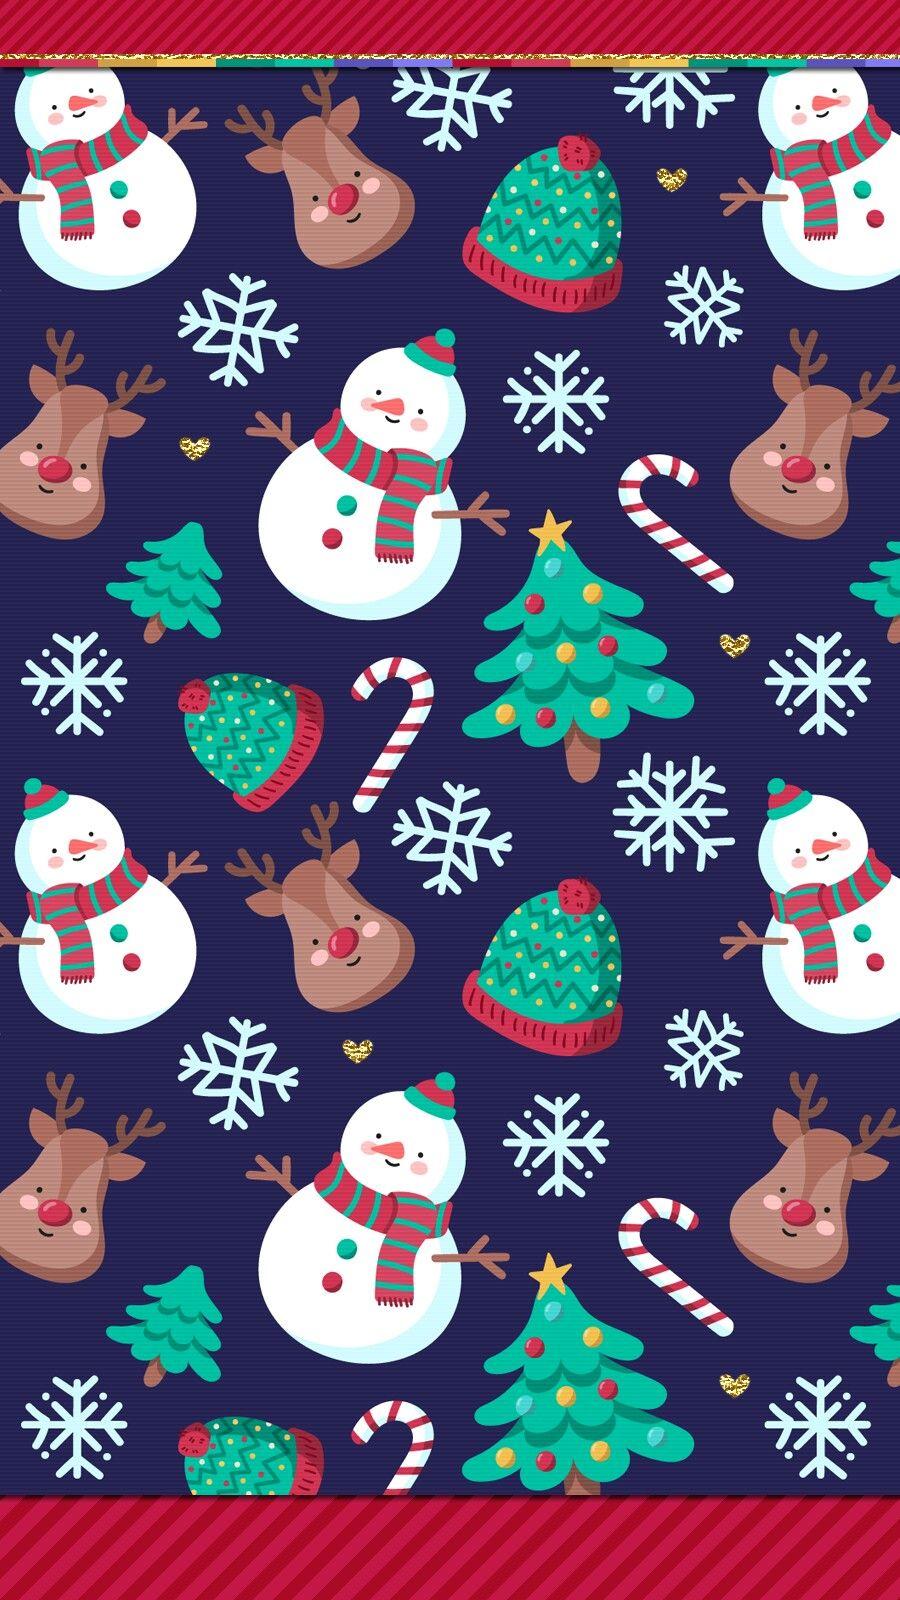 Navidad Christmas Phone Wallpaper Wallpaper Iphone Christmas Cute Christmas Wallpaper Cute christmas phone wallpaper